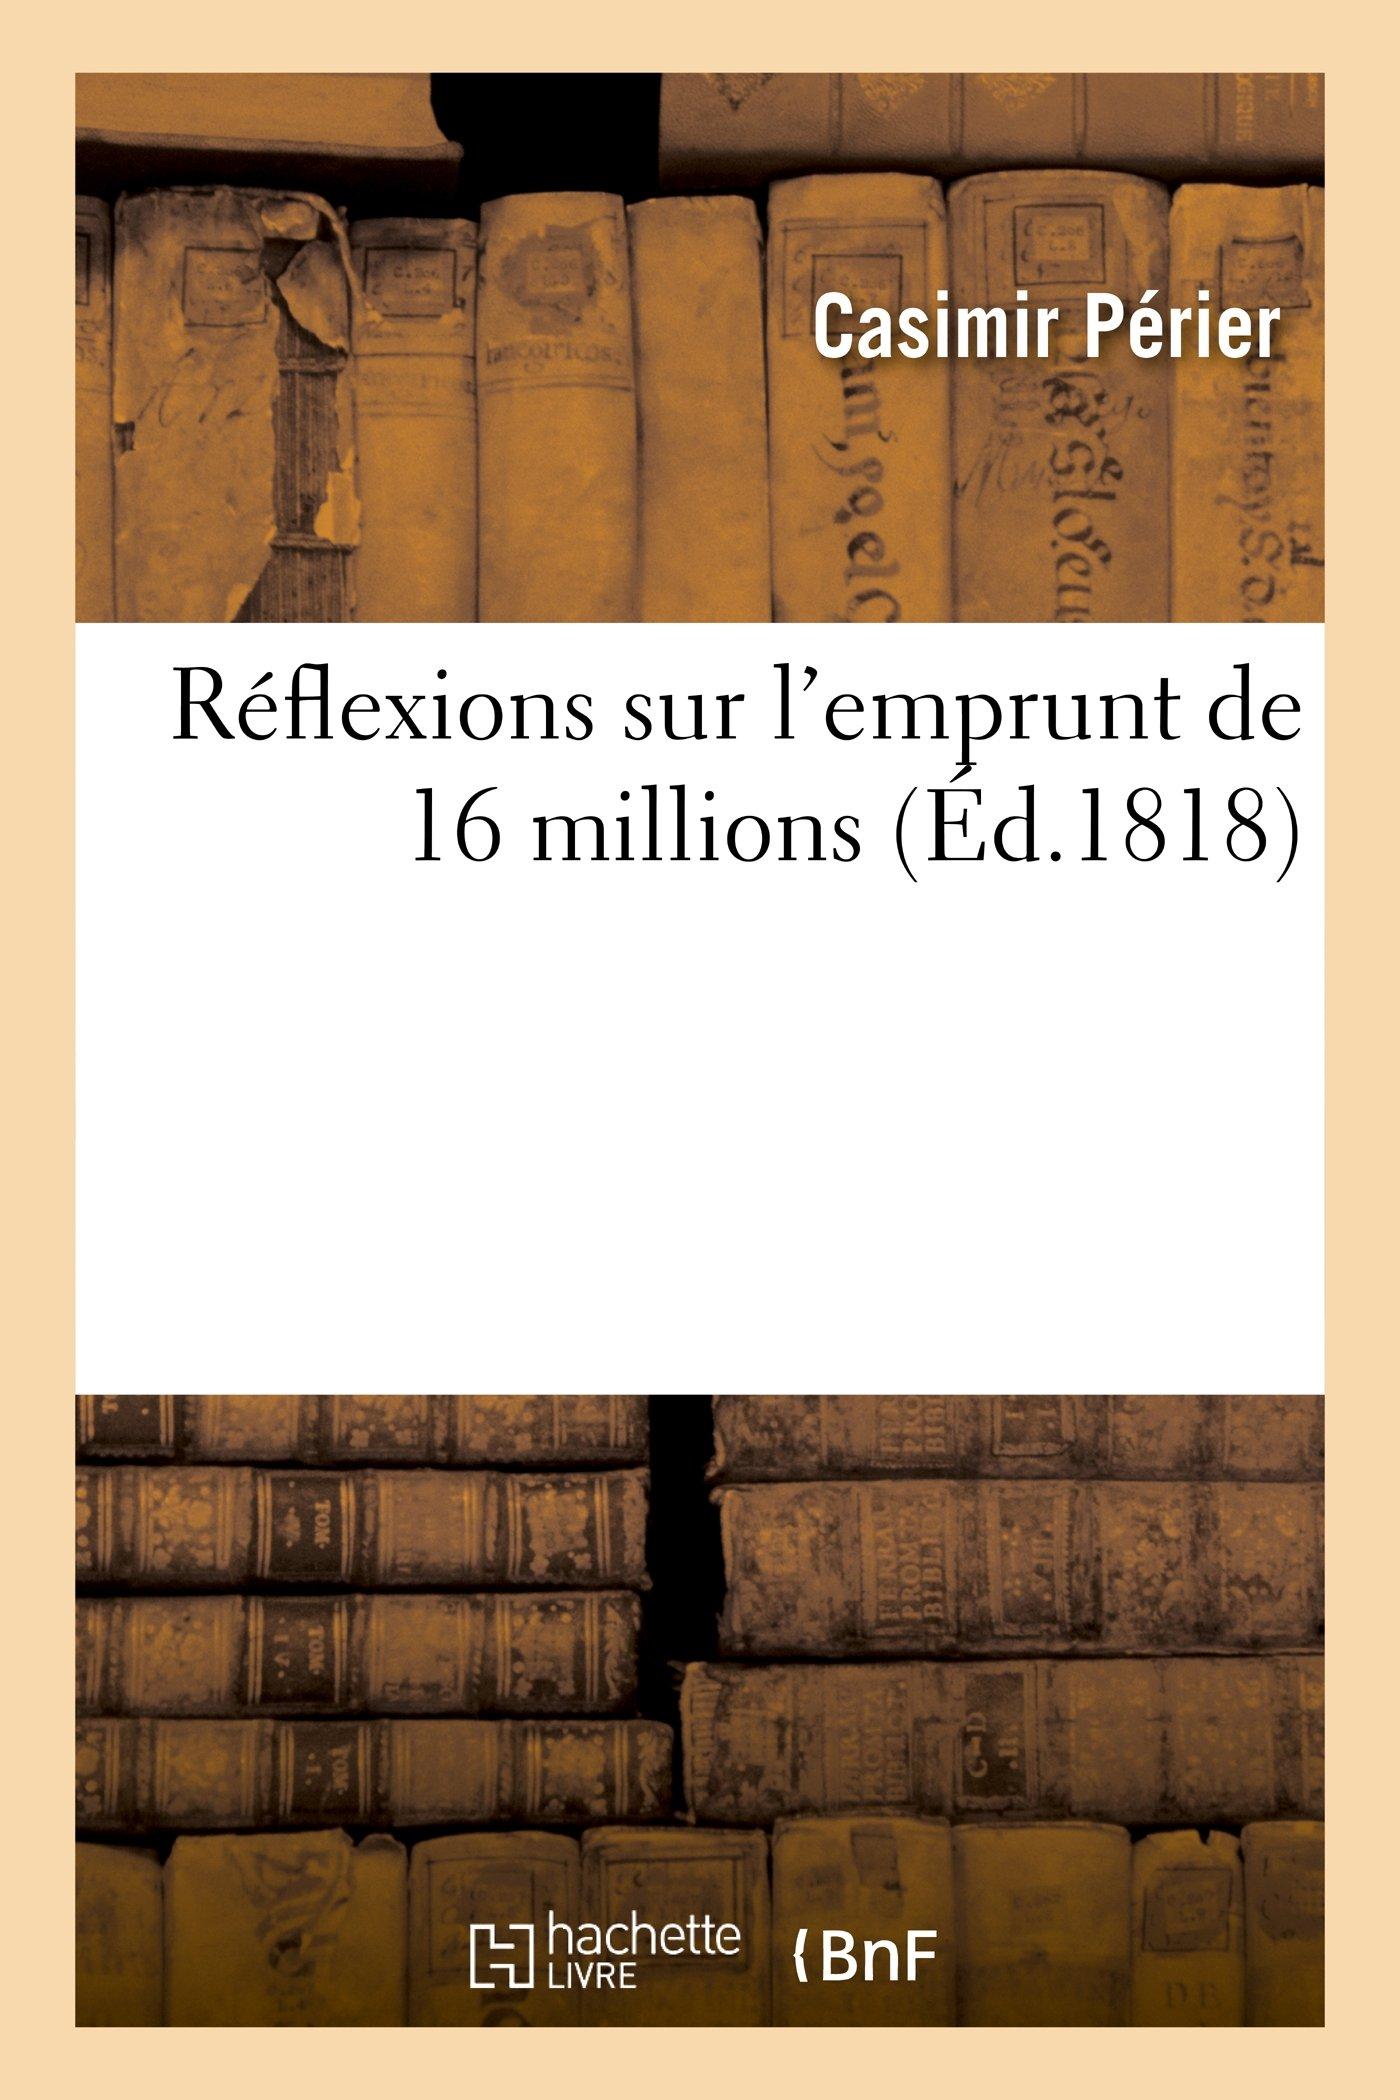 Reflexions Sur L'emprunt De 16 Millions (Sciences Sociales